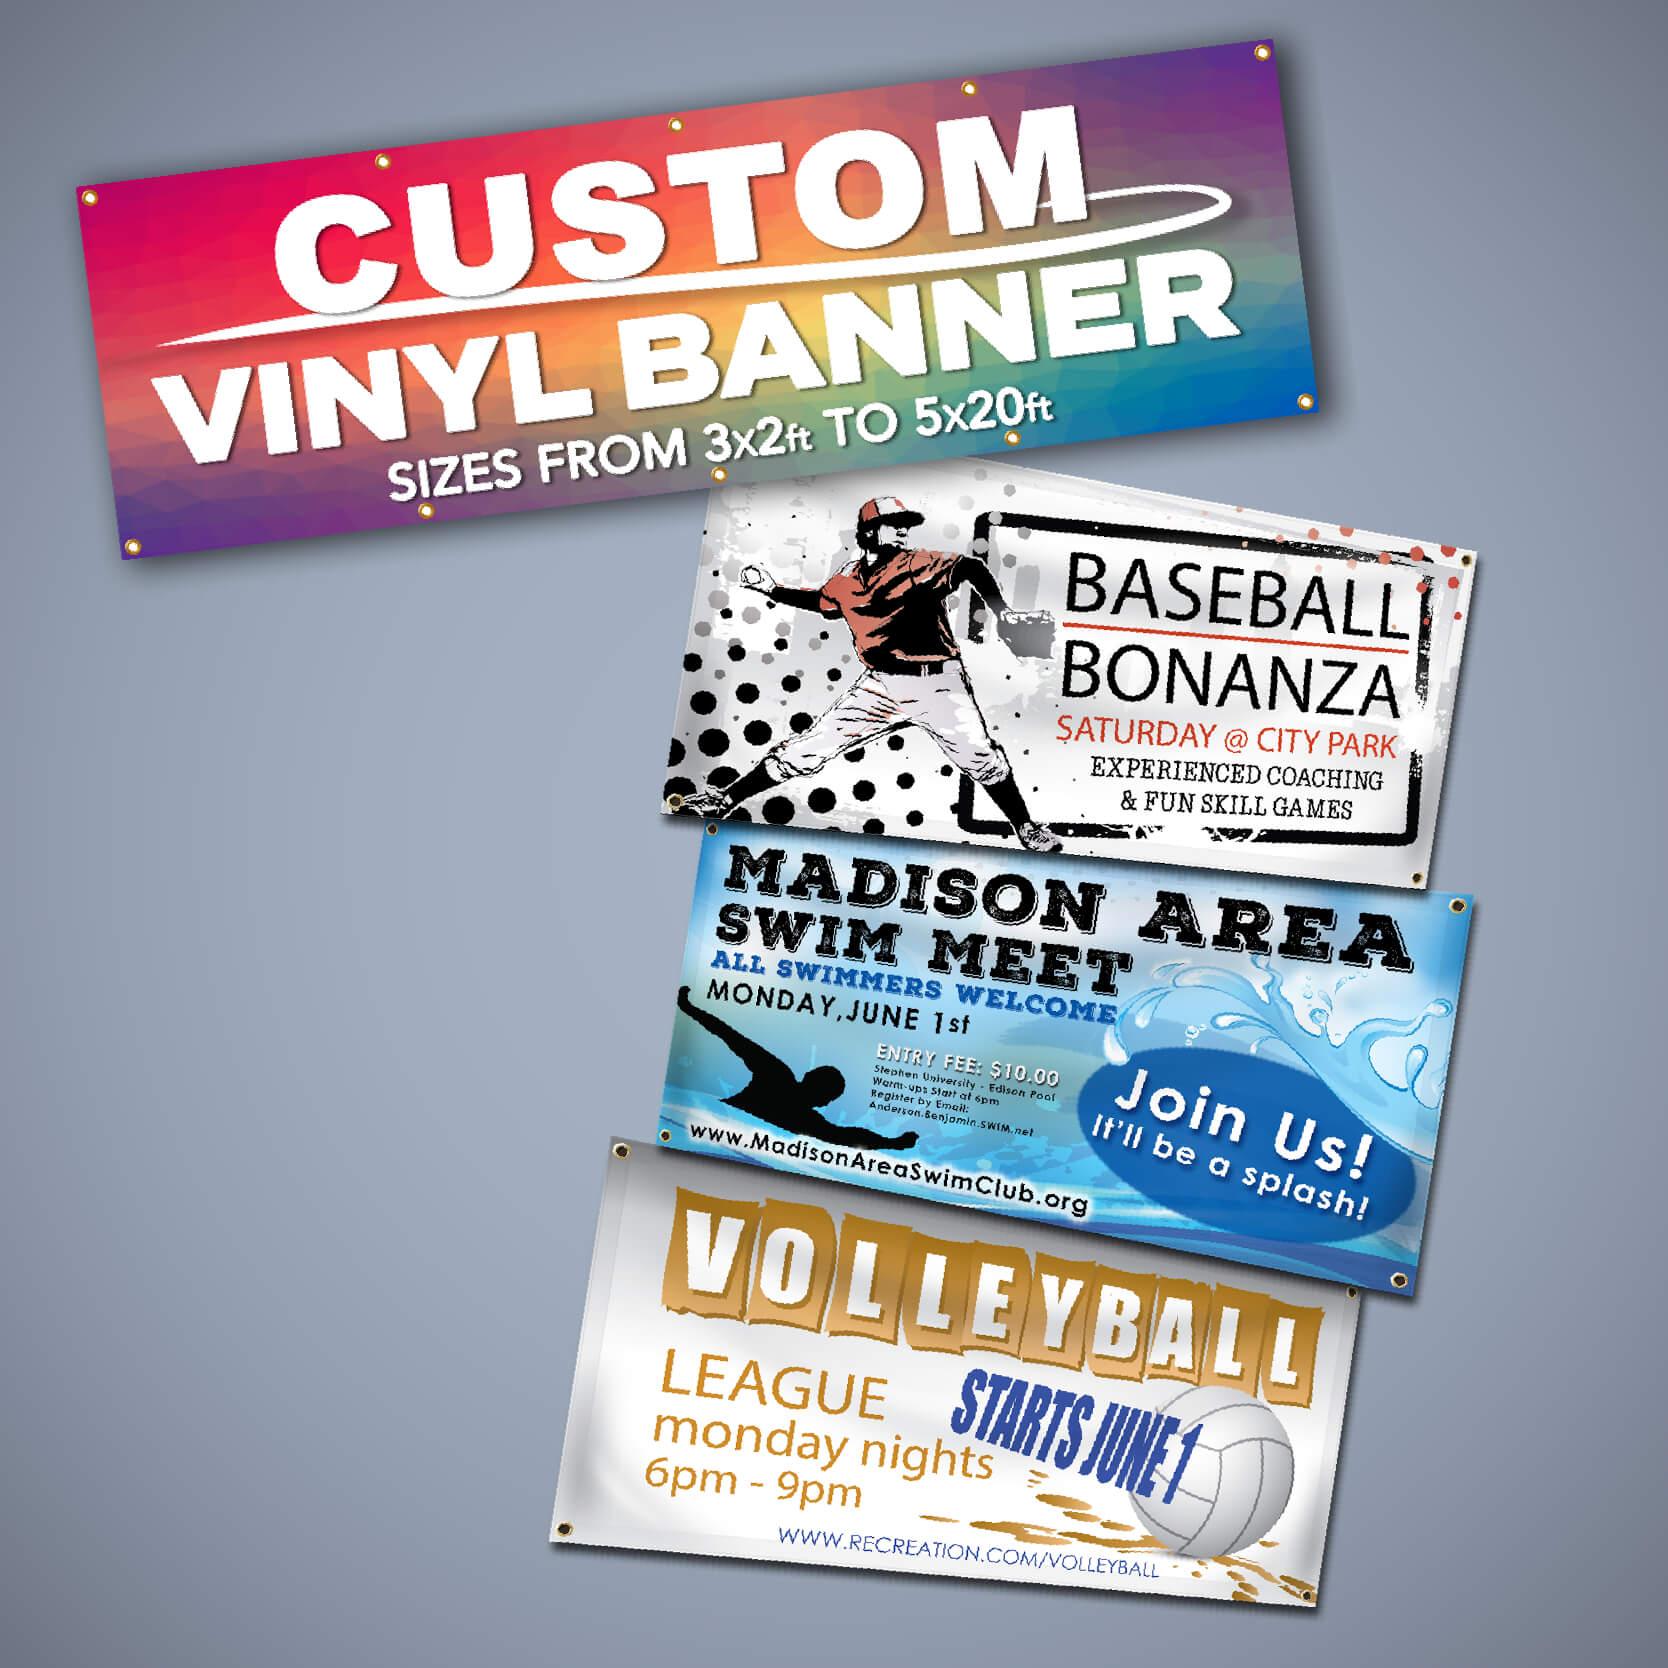 Vinyl Banners With Vinyl Banner Design Templates